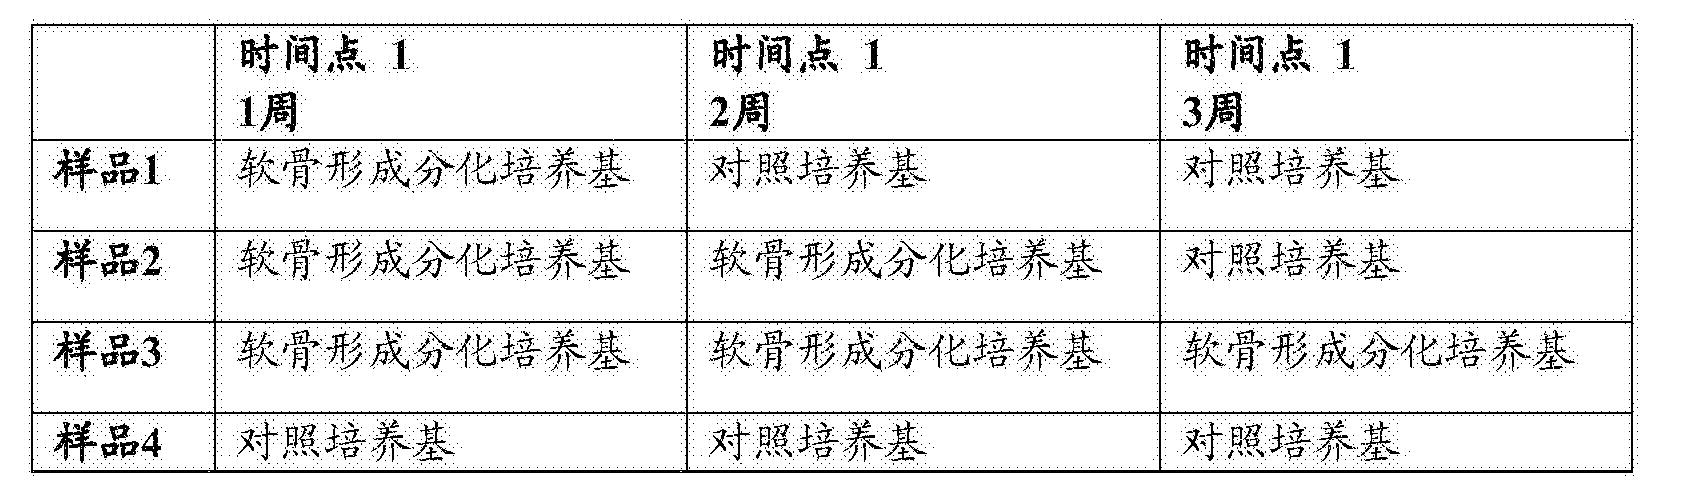 Figure CN107530360AD00272